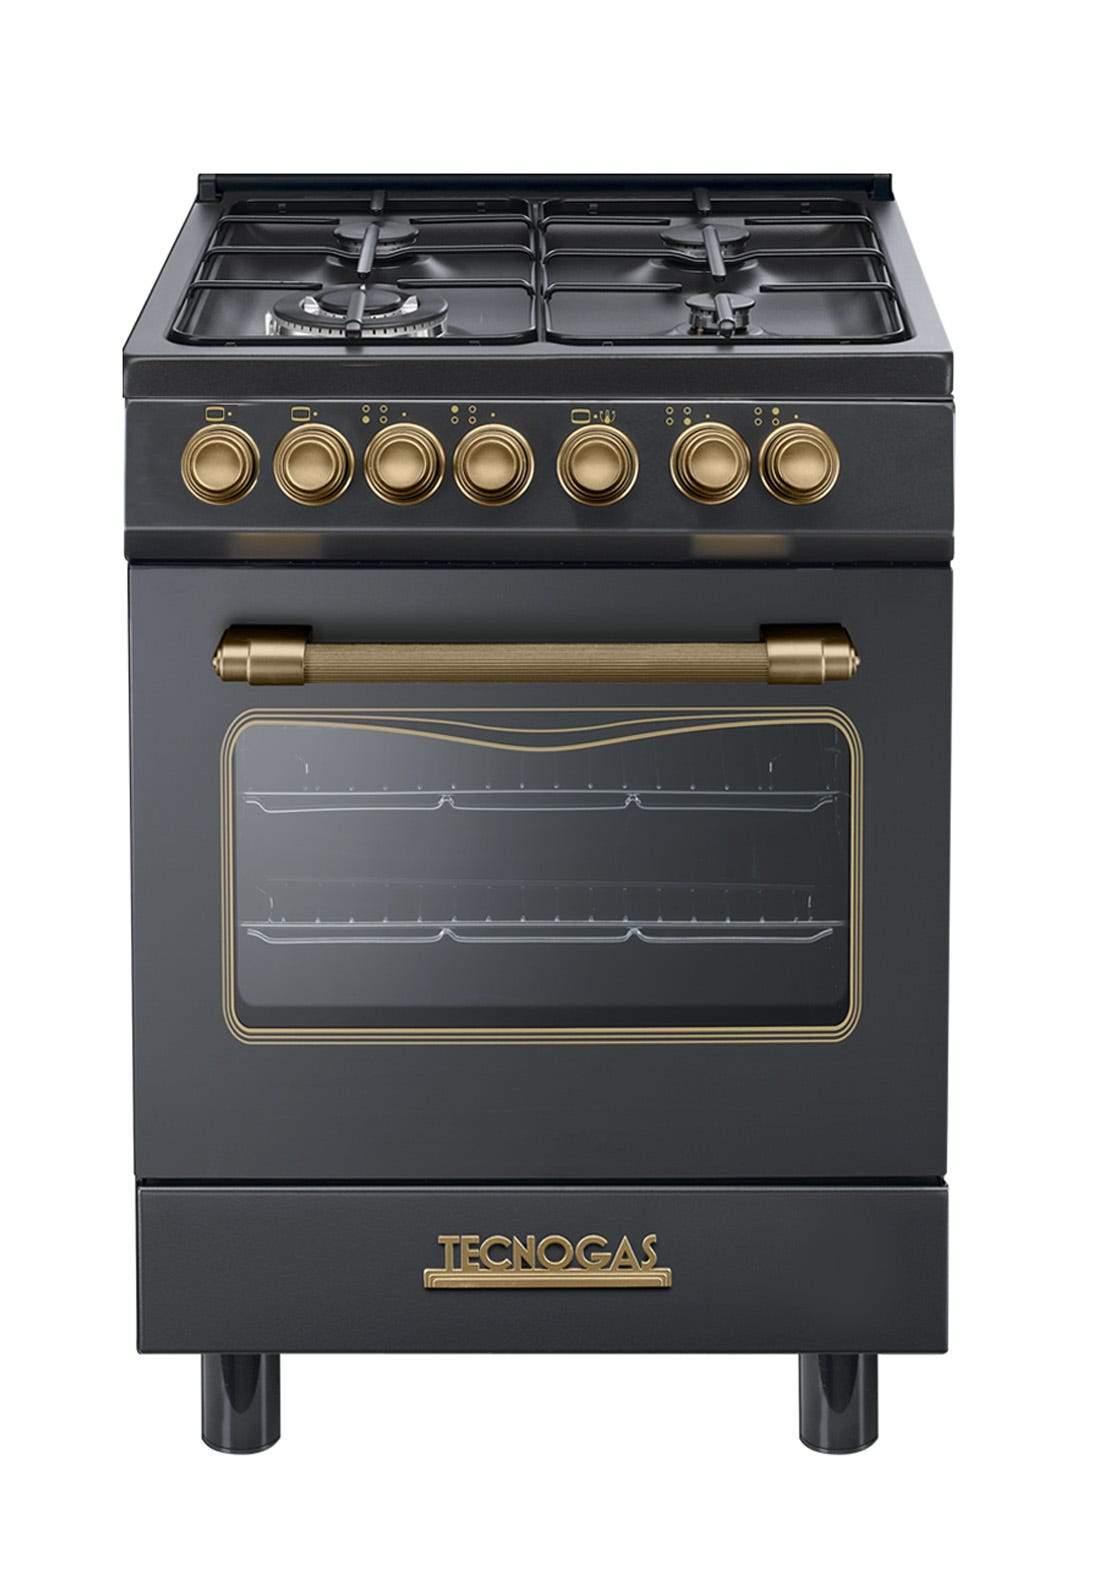 Tecnogas Cooker - D1B066G4VC طباخ